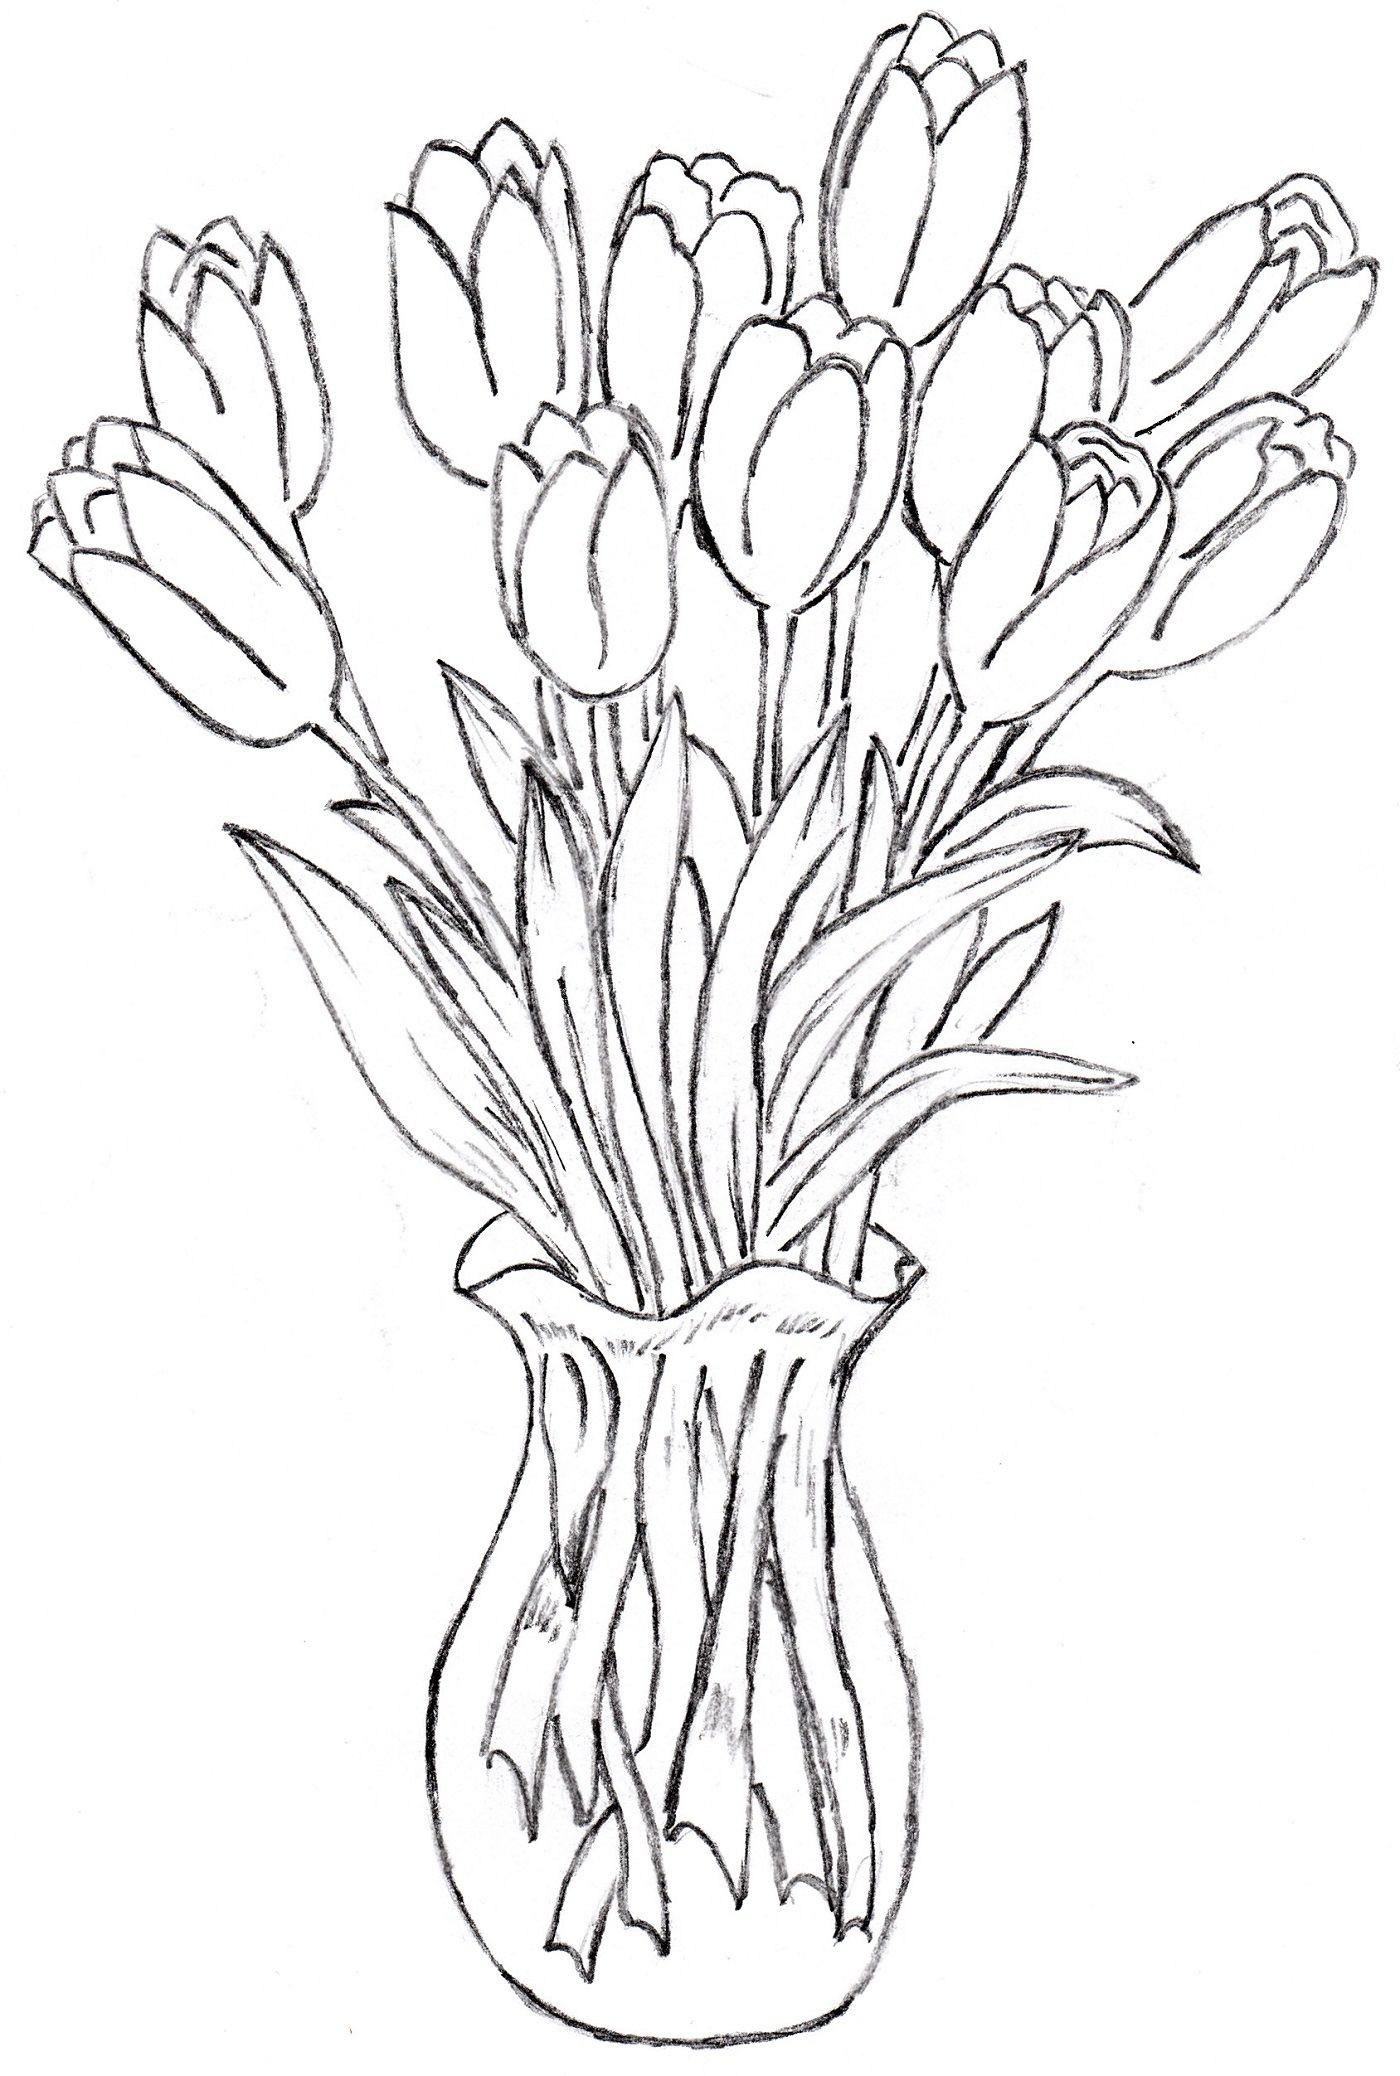 Flower Vase Drawing Photos In A Vase Drawing Drawings Gallery Drawings Flower Vase Drawing Flower Vases Large Ceramic Vase